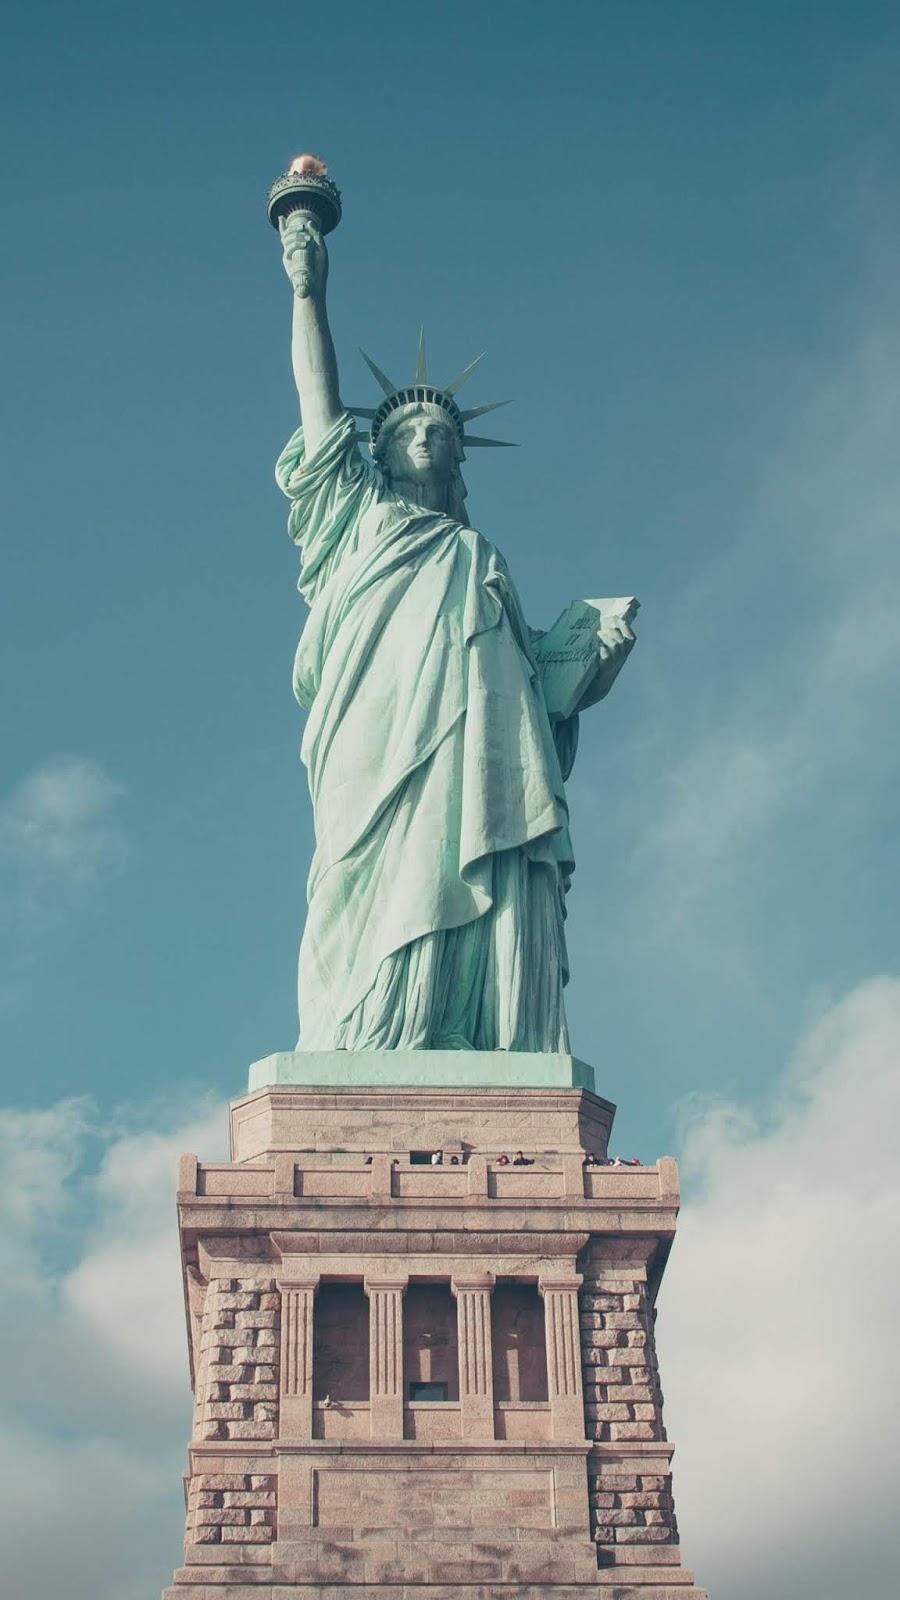 Statue of Liberty Phone Wallpaper